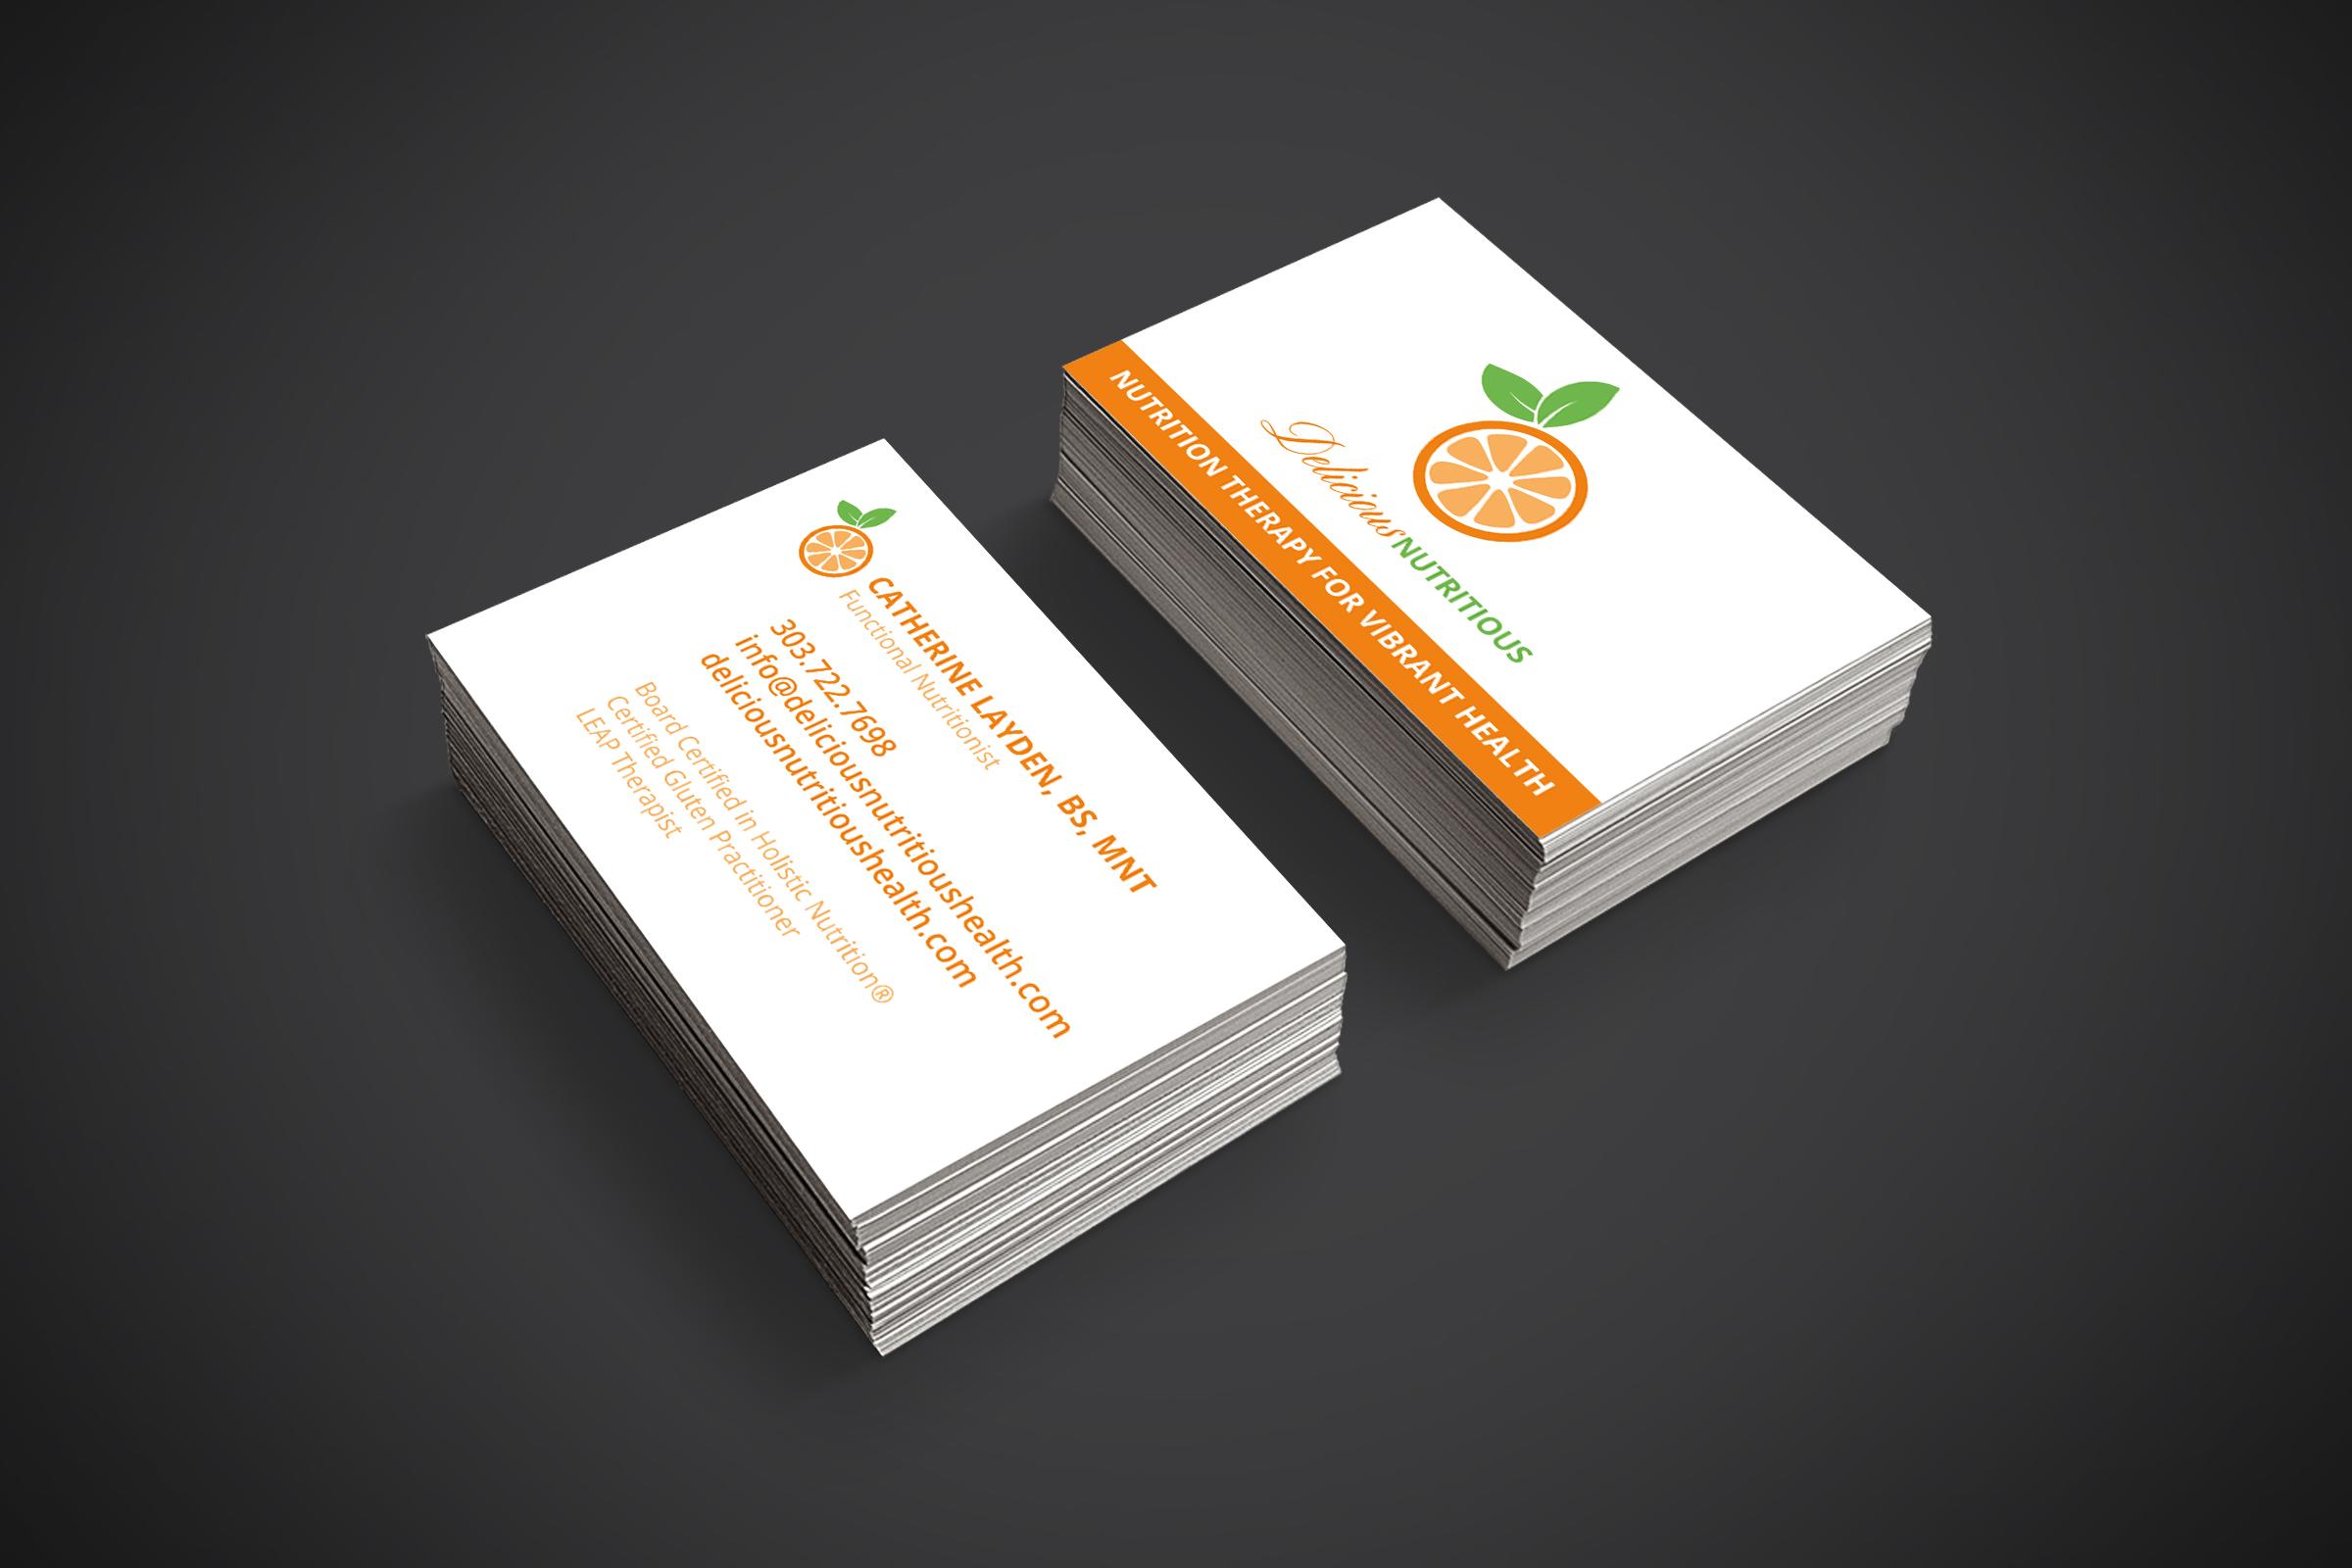 hearthfire-creative-logo-brand-identity-designer-denver-colorado-delicious-nutritious-4.jpg